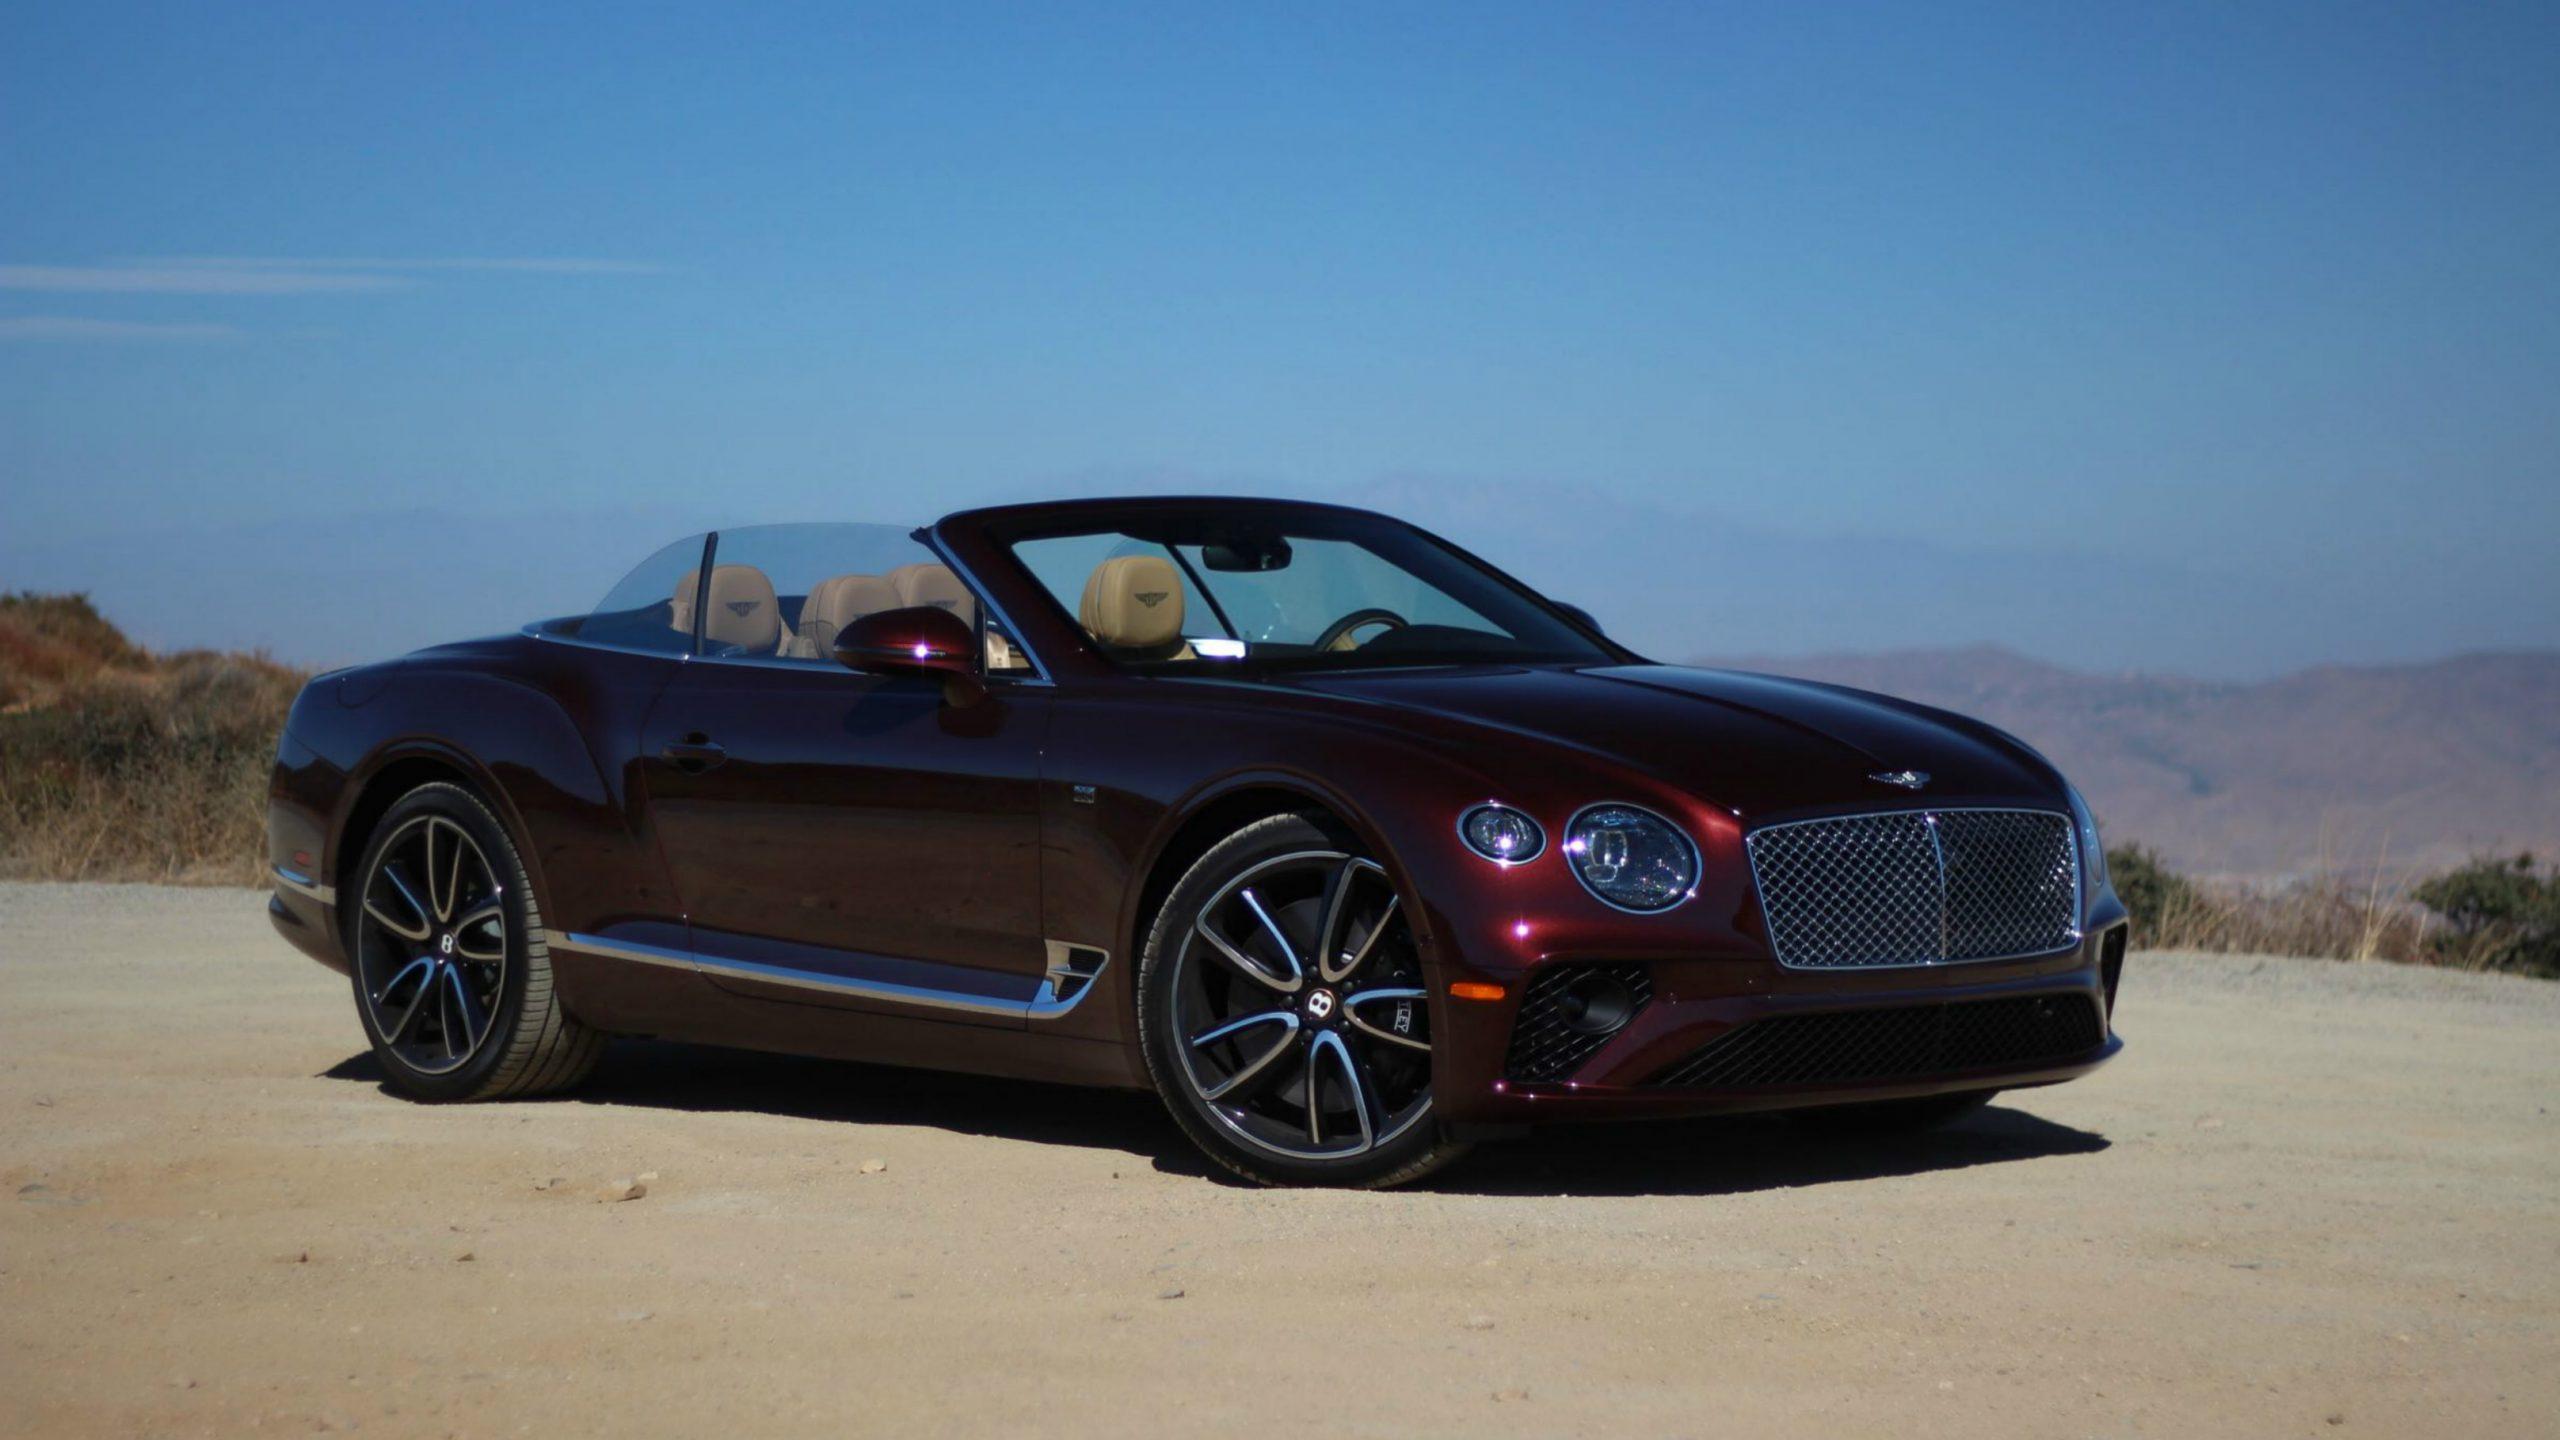 Review: 2020 Bentley Continental GTC V8